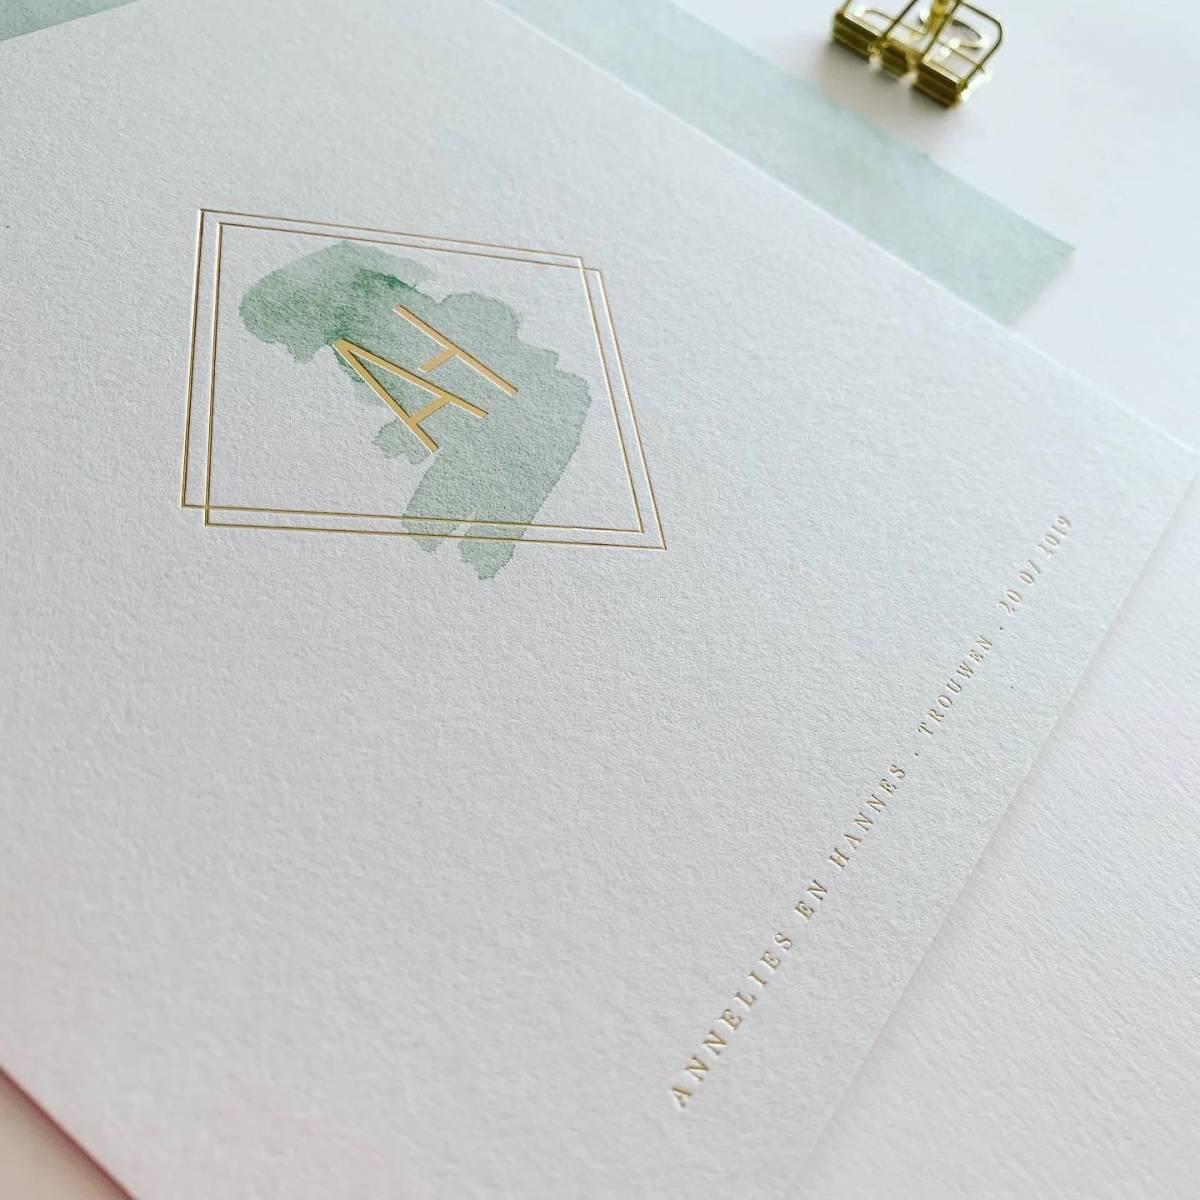 Scarabar - Trouwuitnodiging - Huwelijksuitnodiging - Drukwerk - Huwelijk - Trouw - Bruiloft - House of Weddings - 15